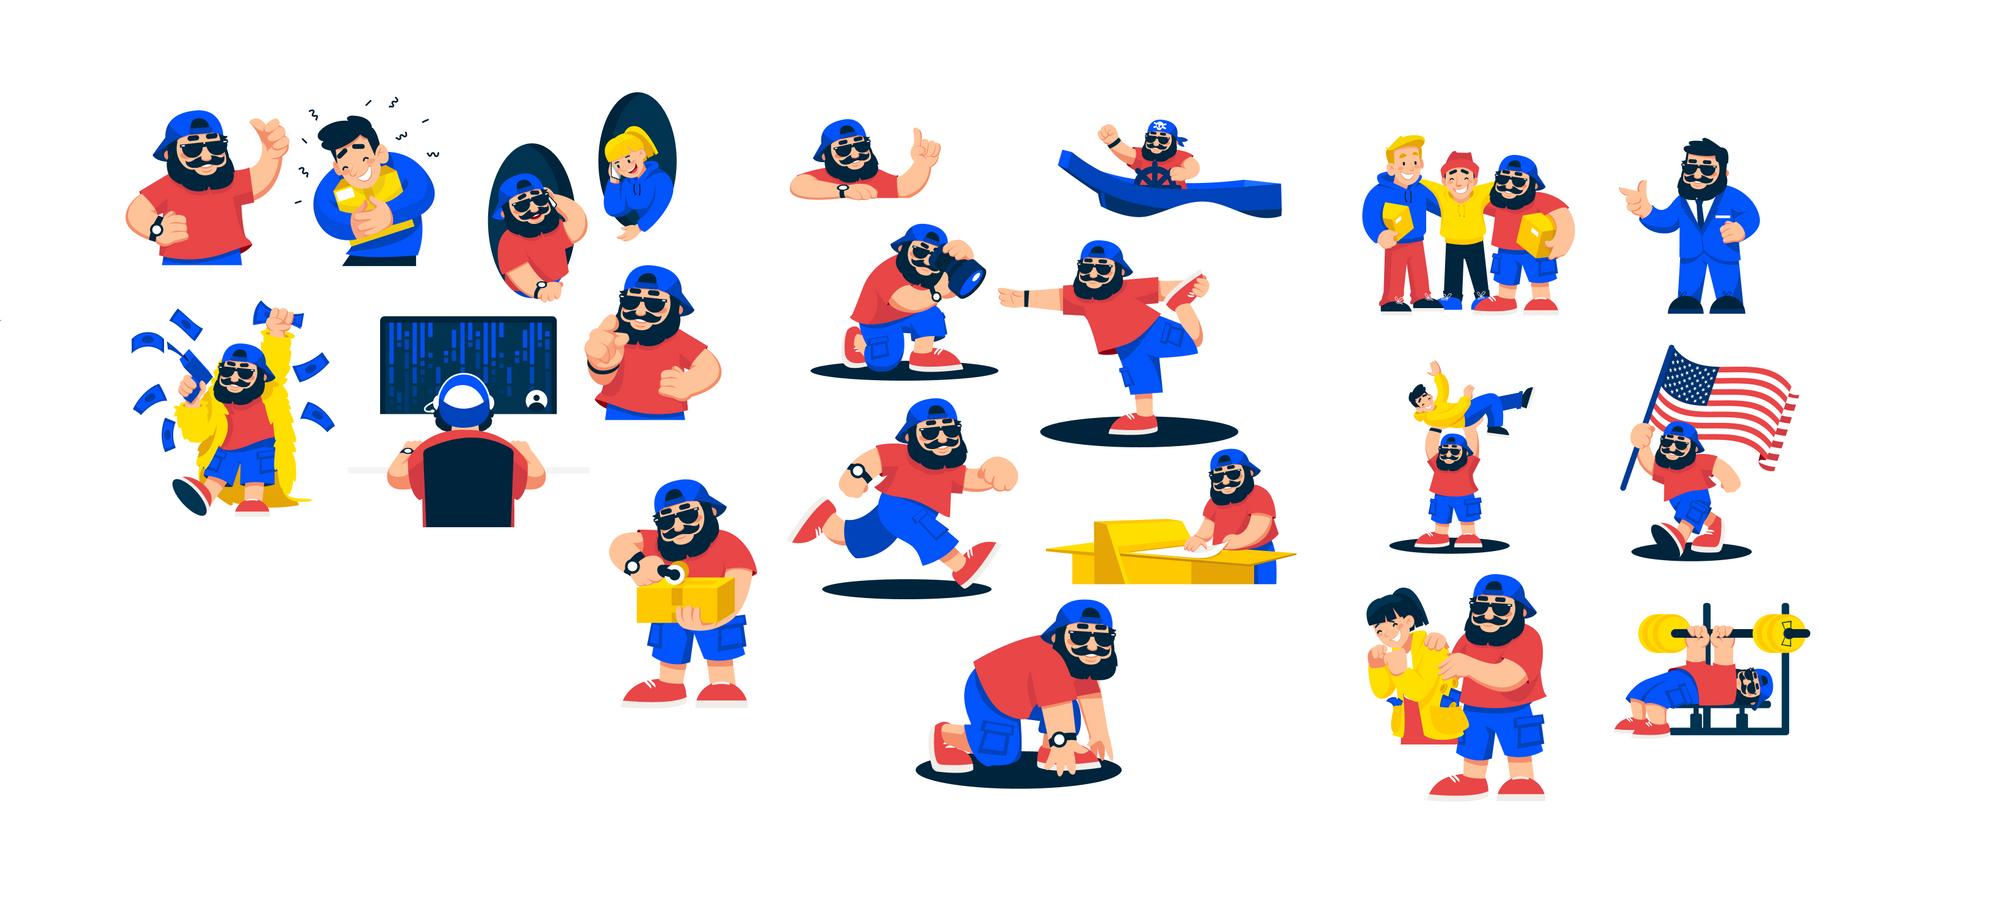 shipdaddy mascot designs